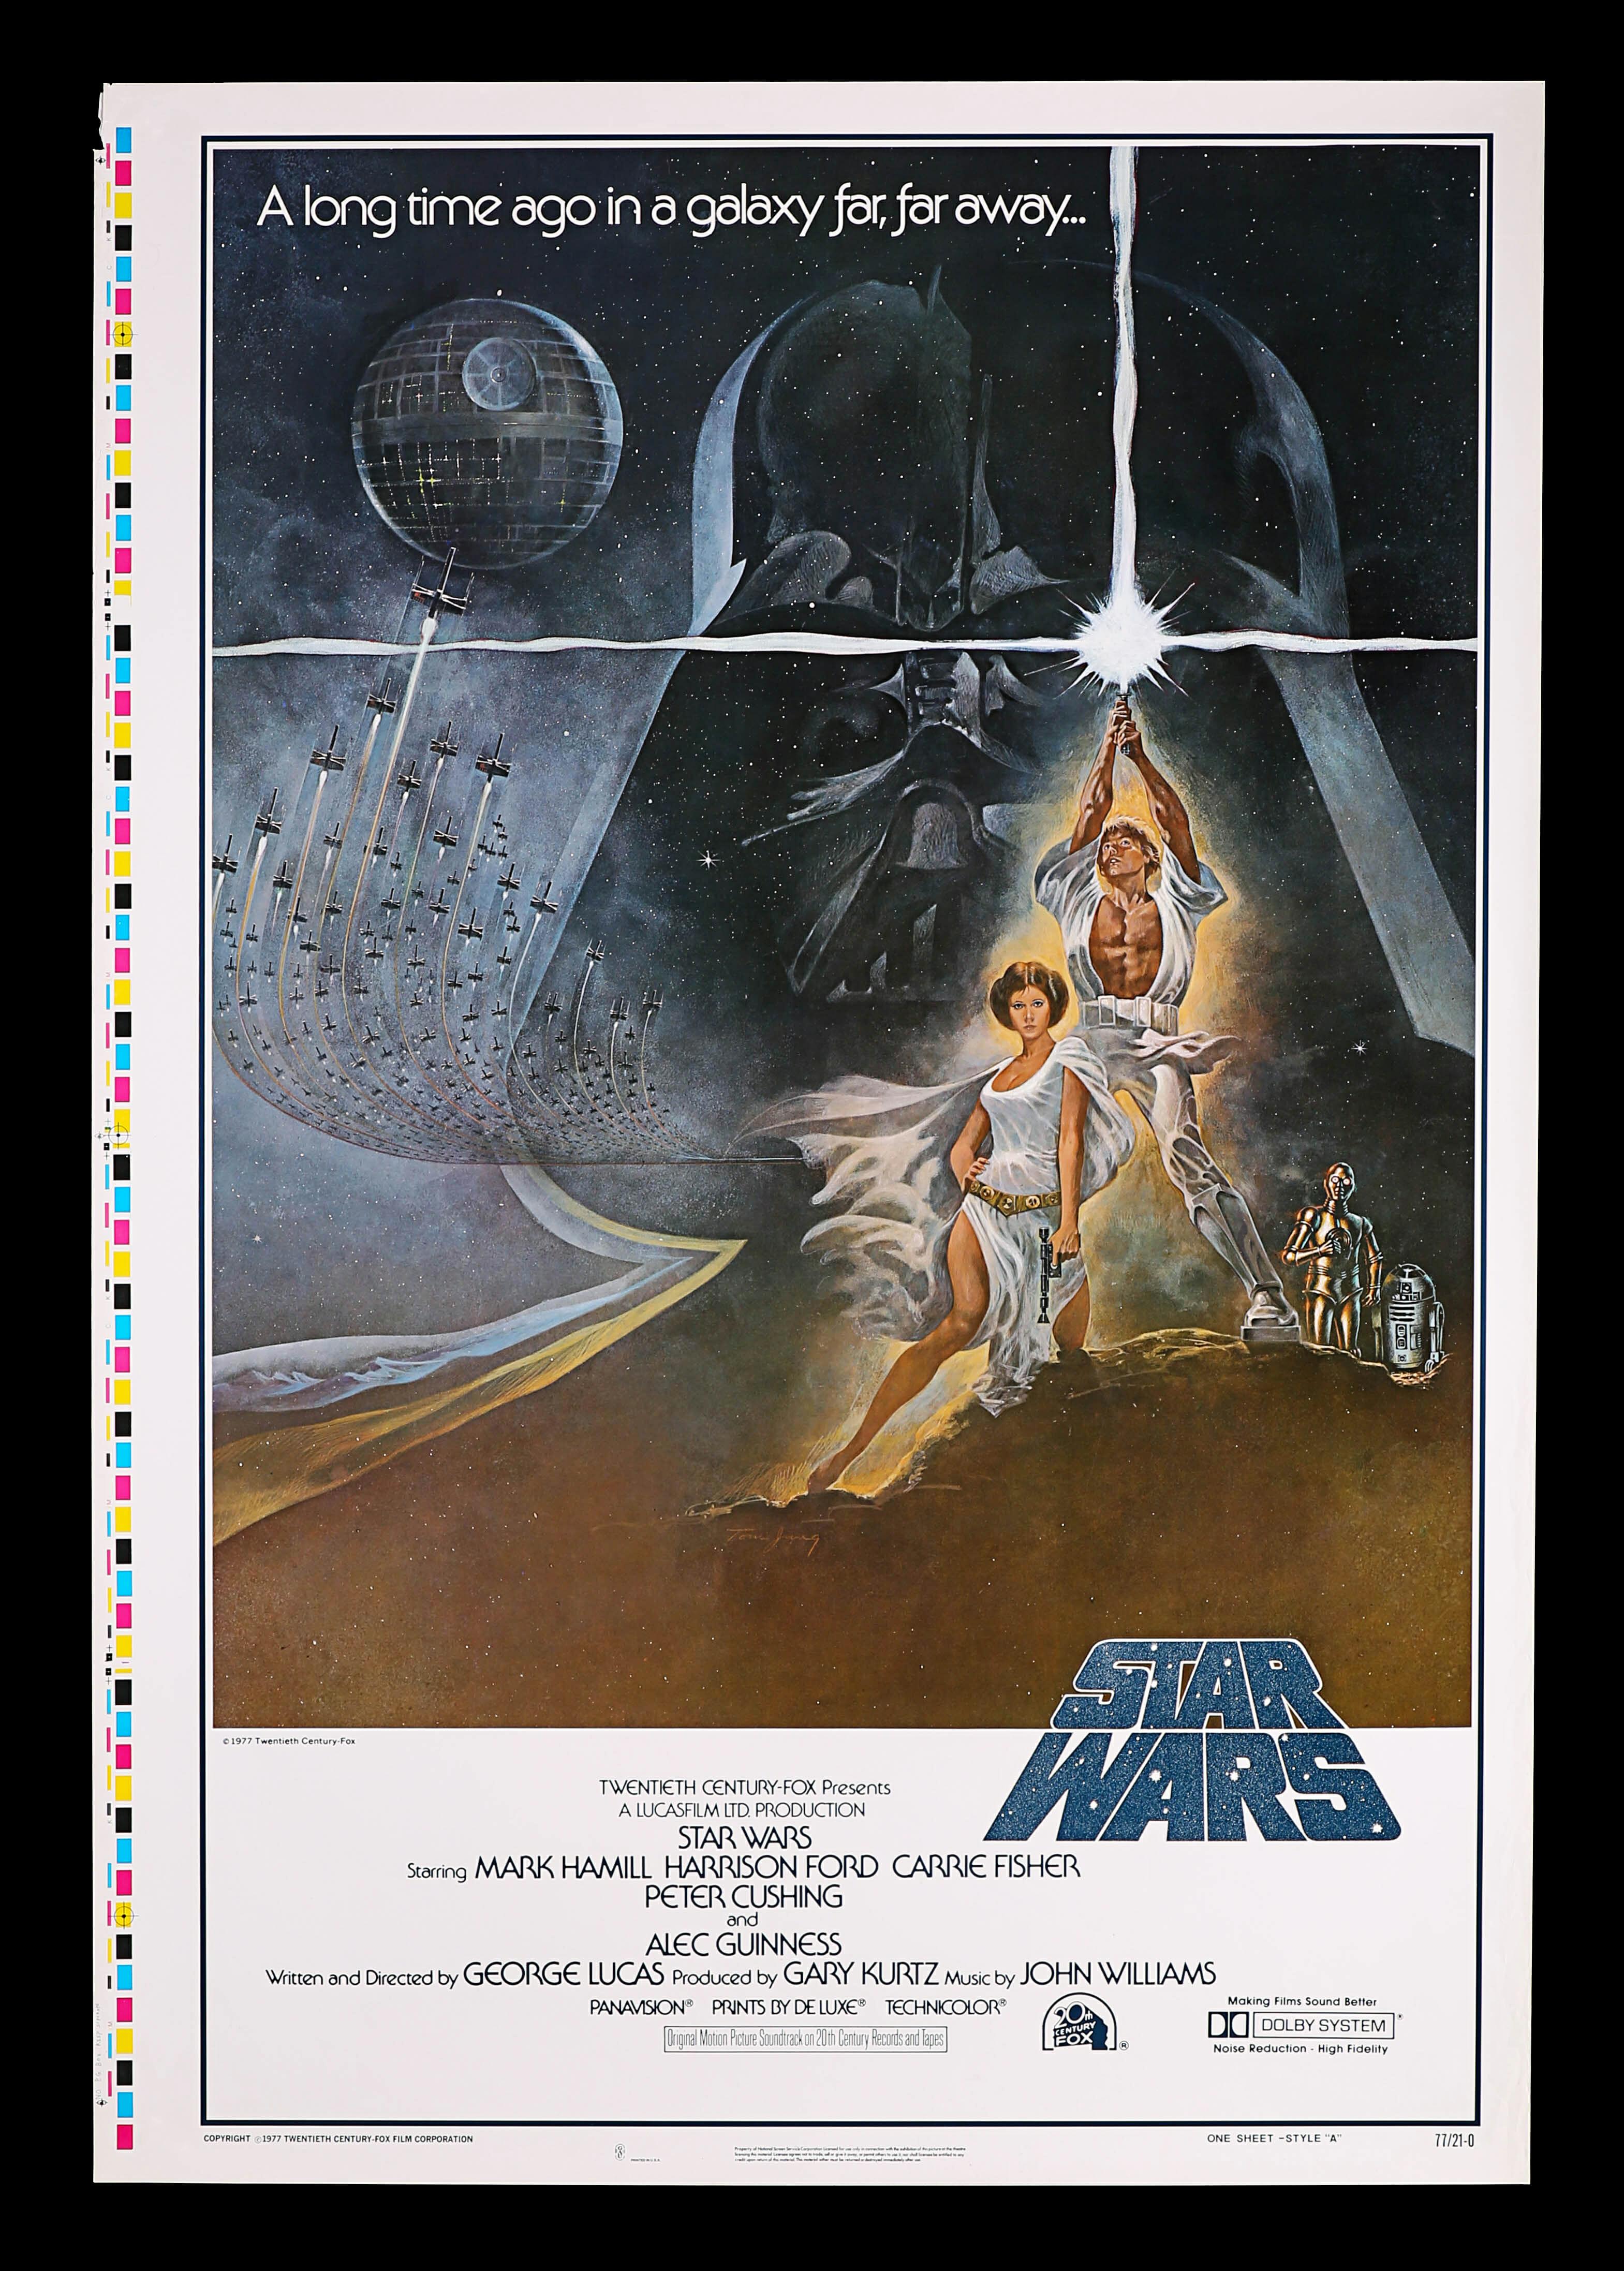 Star Wars one sheet